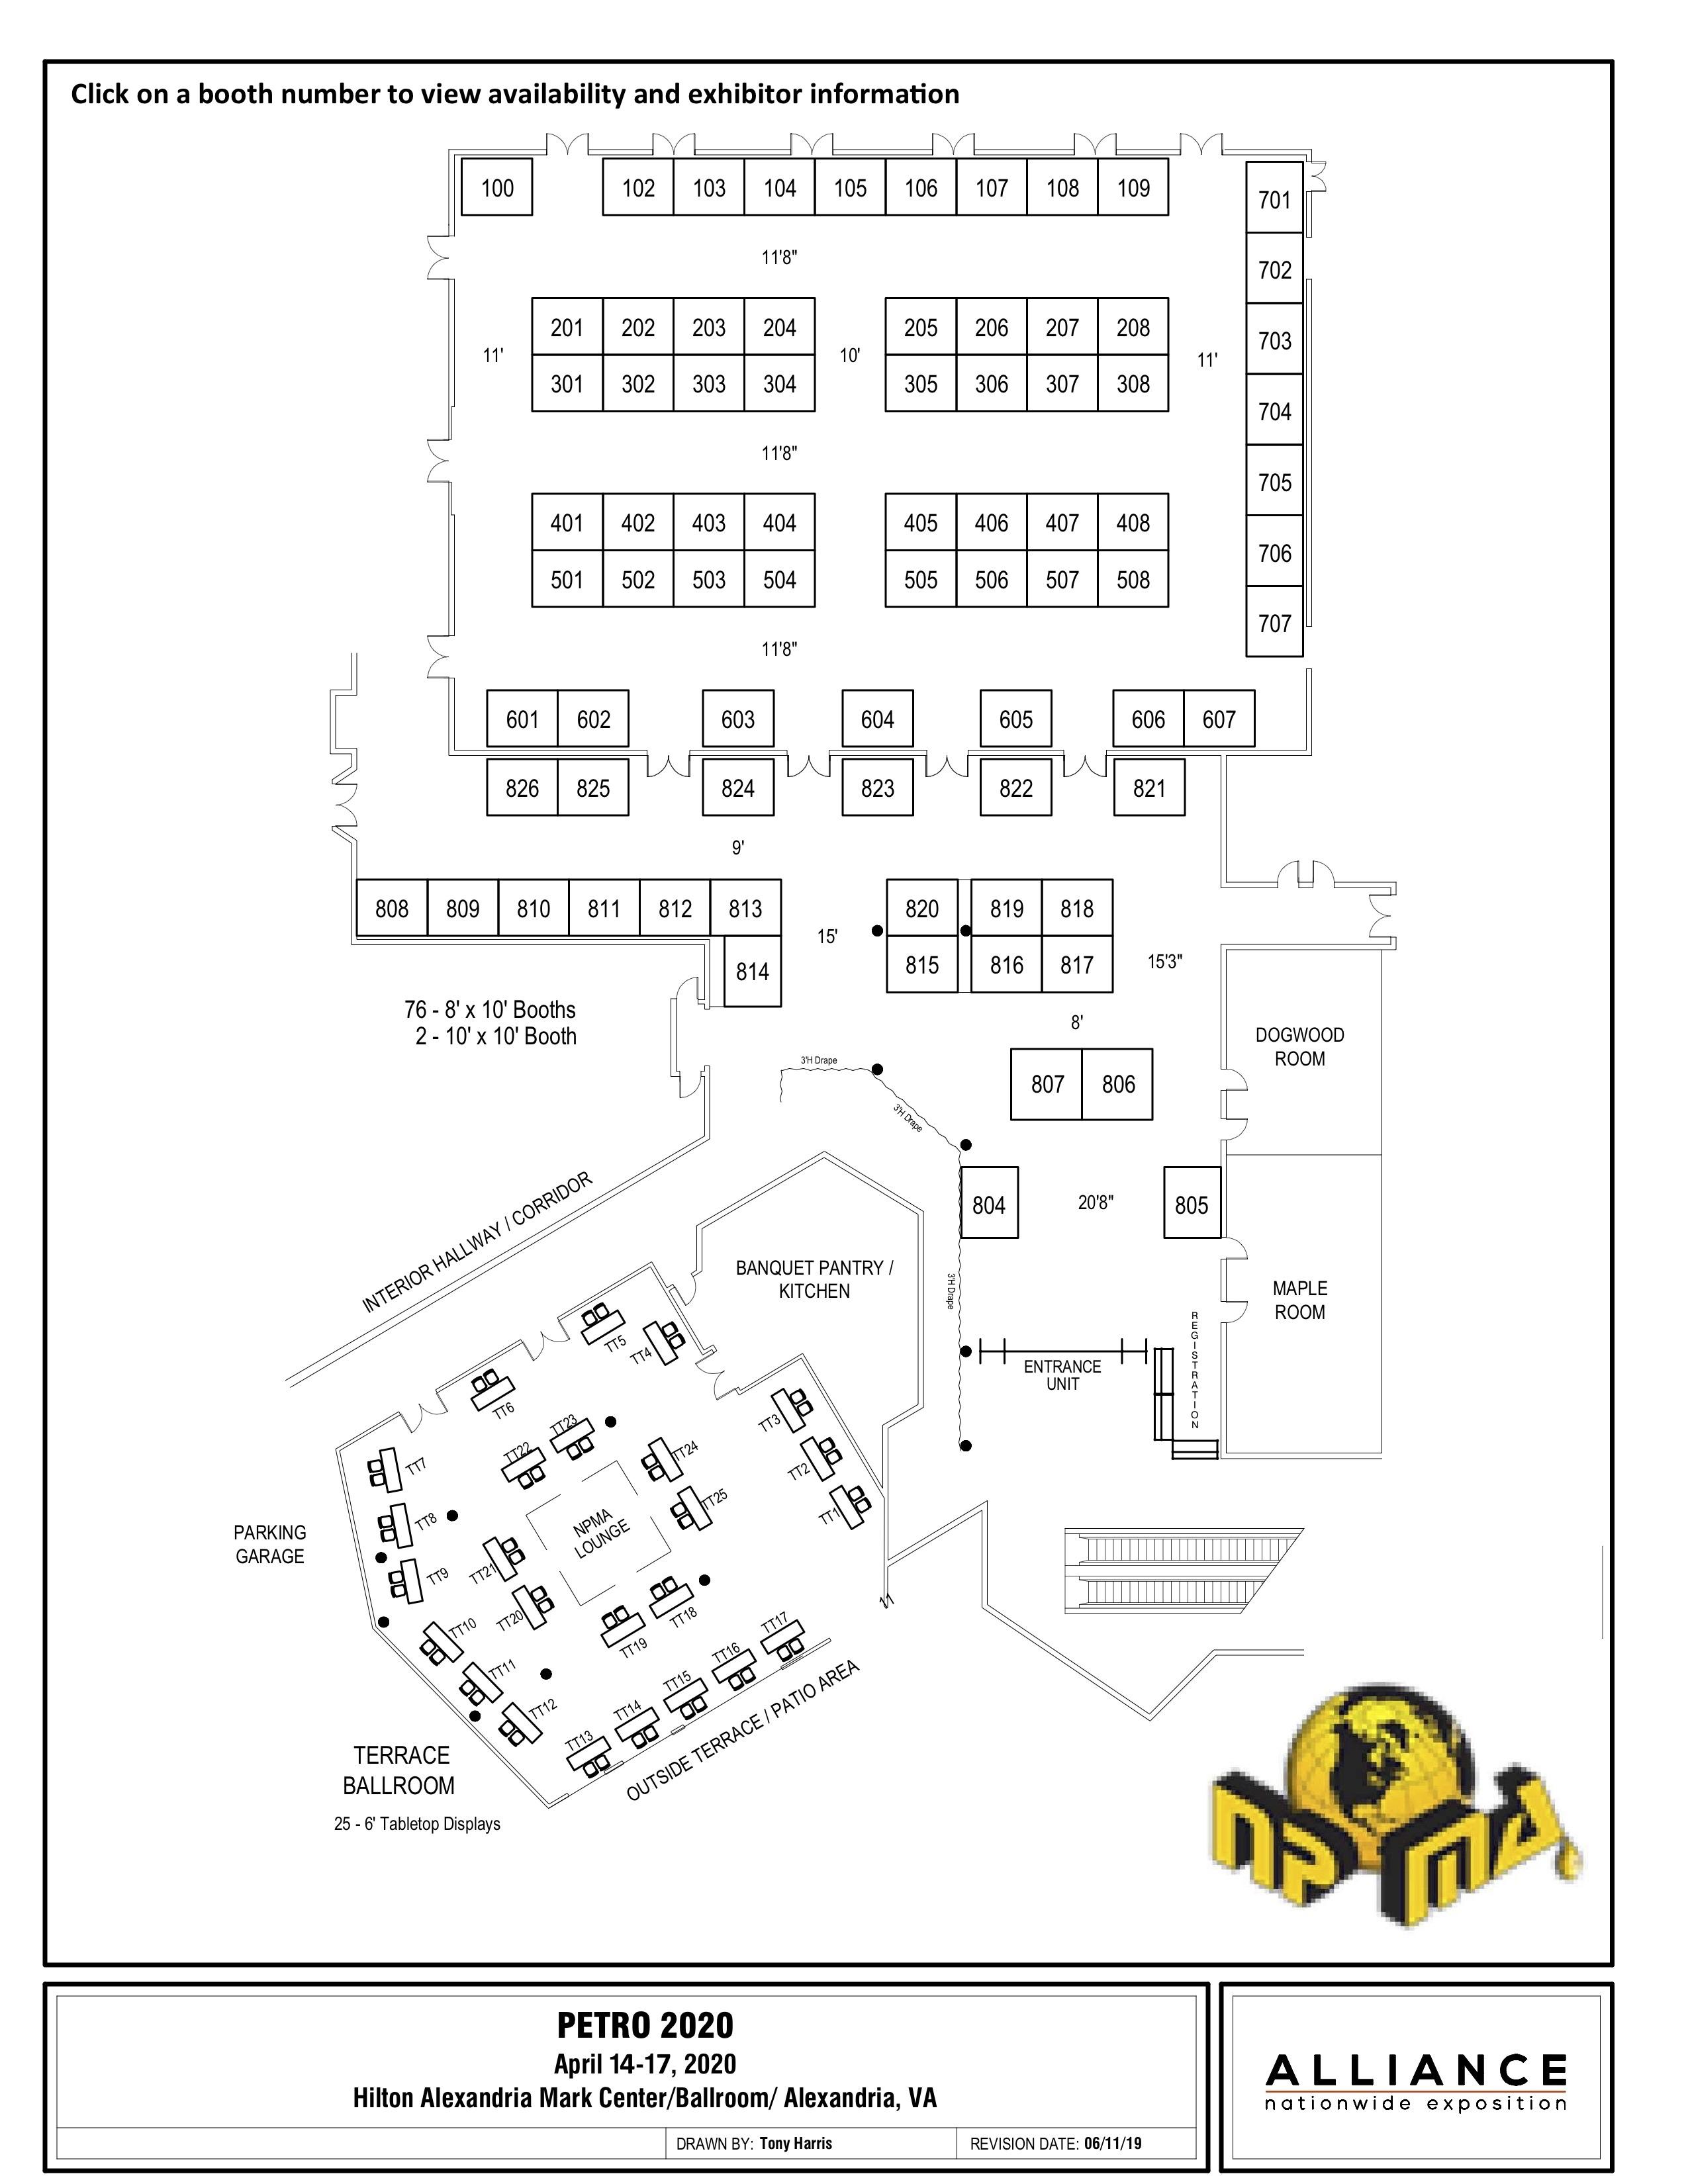 PETRO 2020 Exhibitor Booth Floor Plan